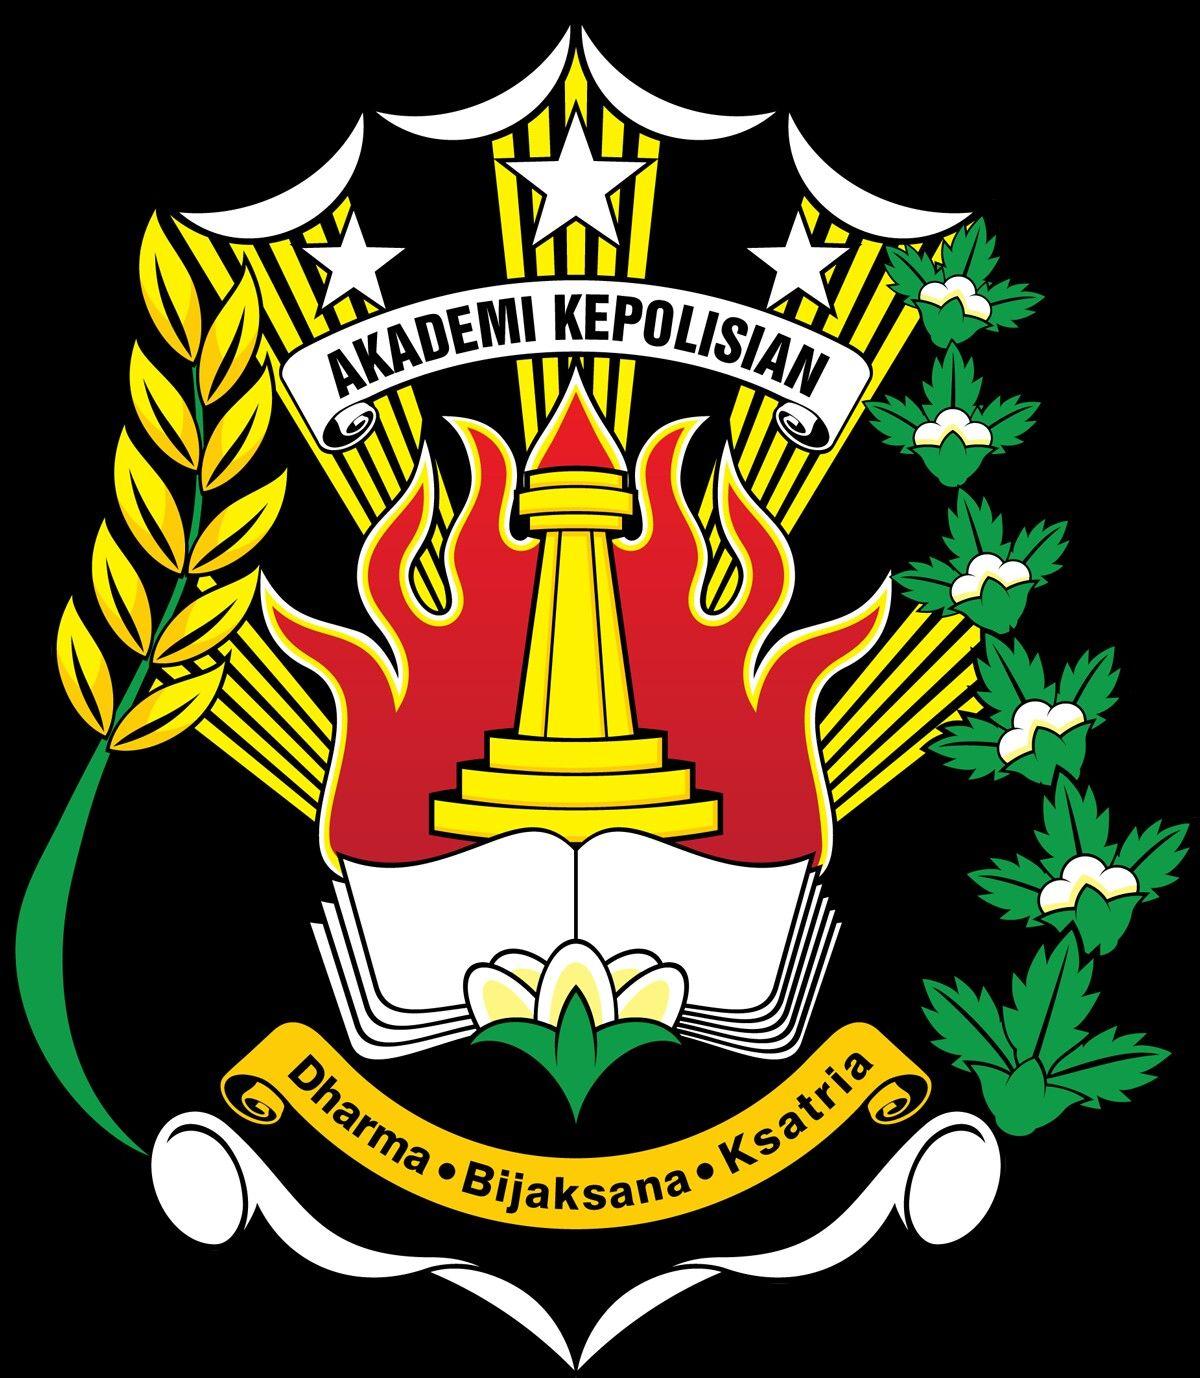 Indonesian Police Academy Militer, Polisi, Gambar